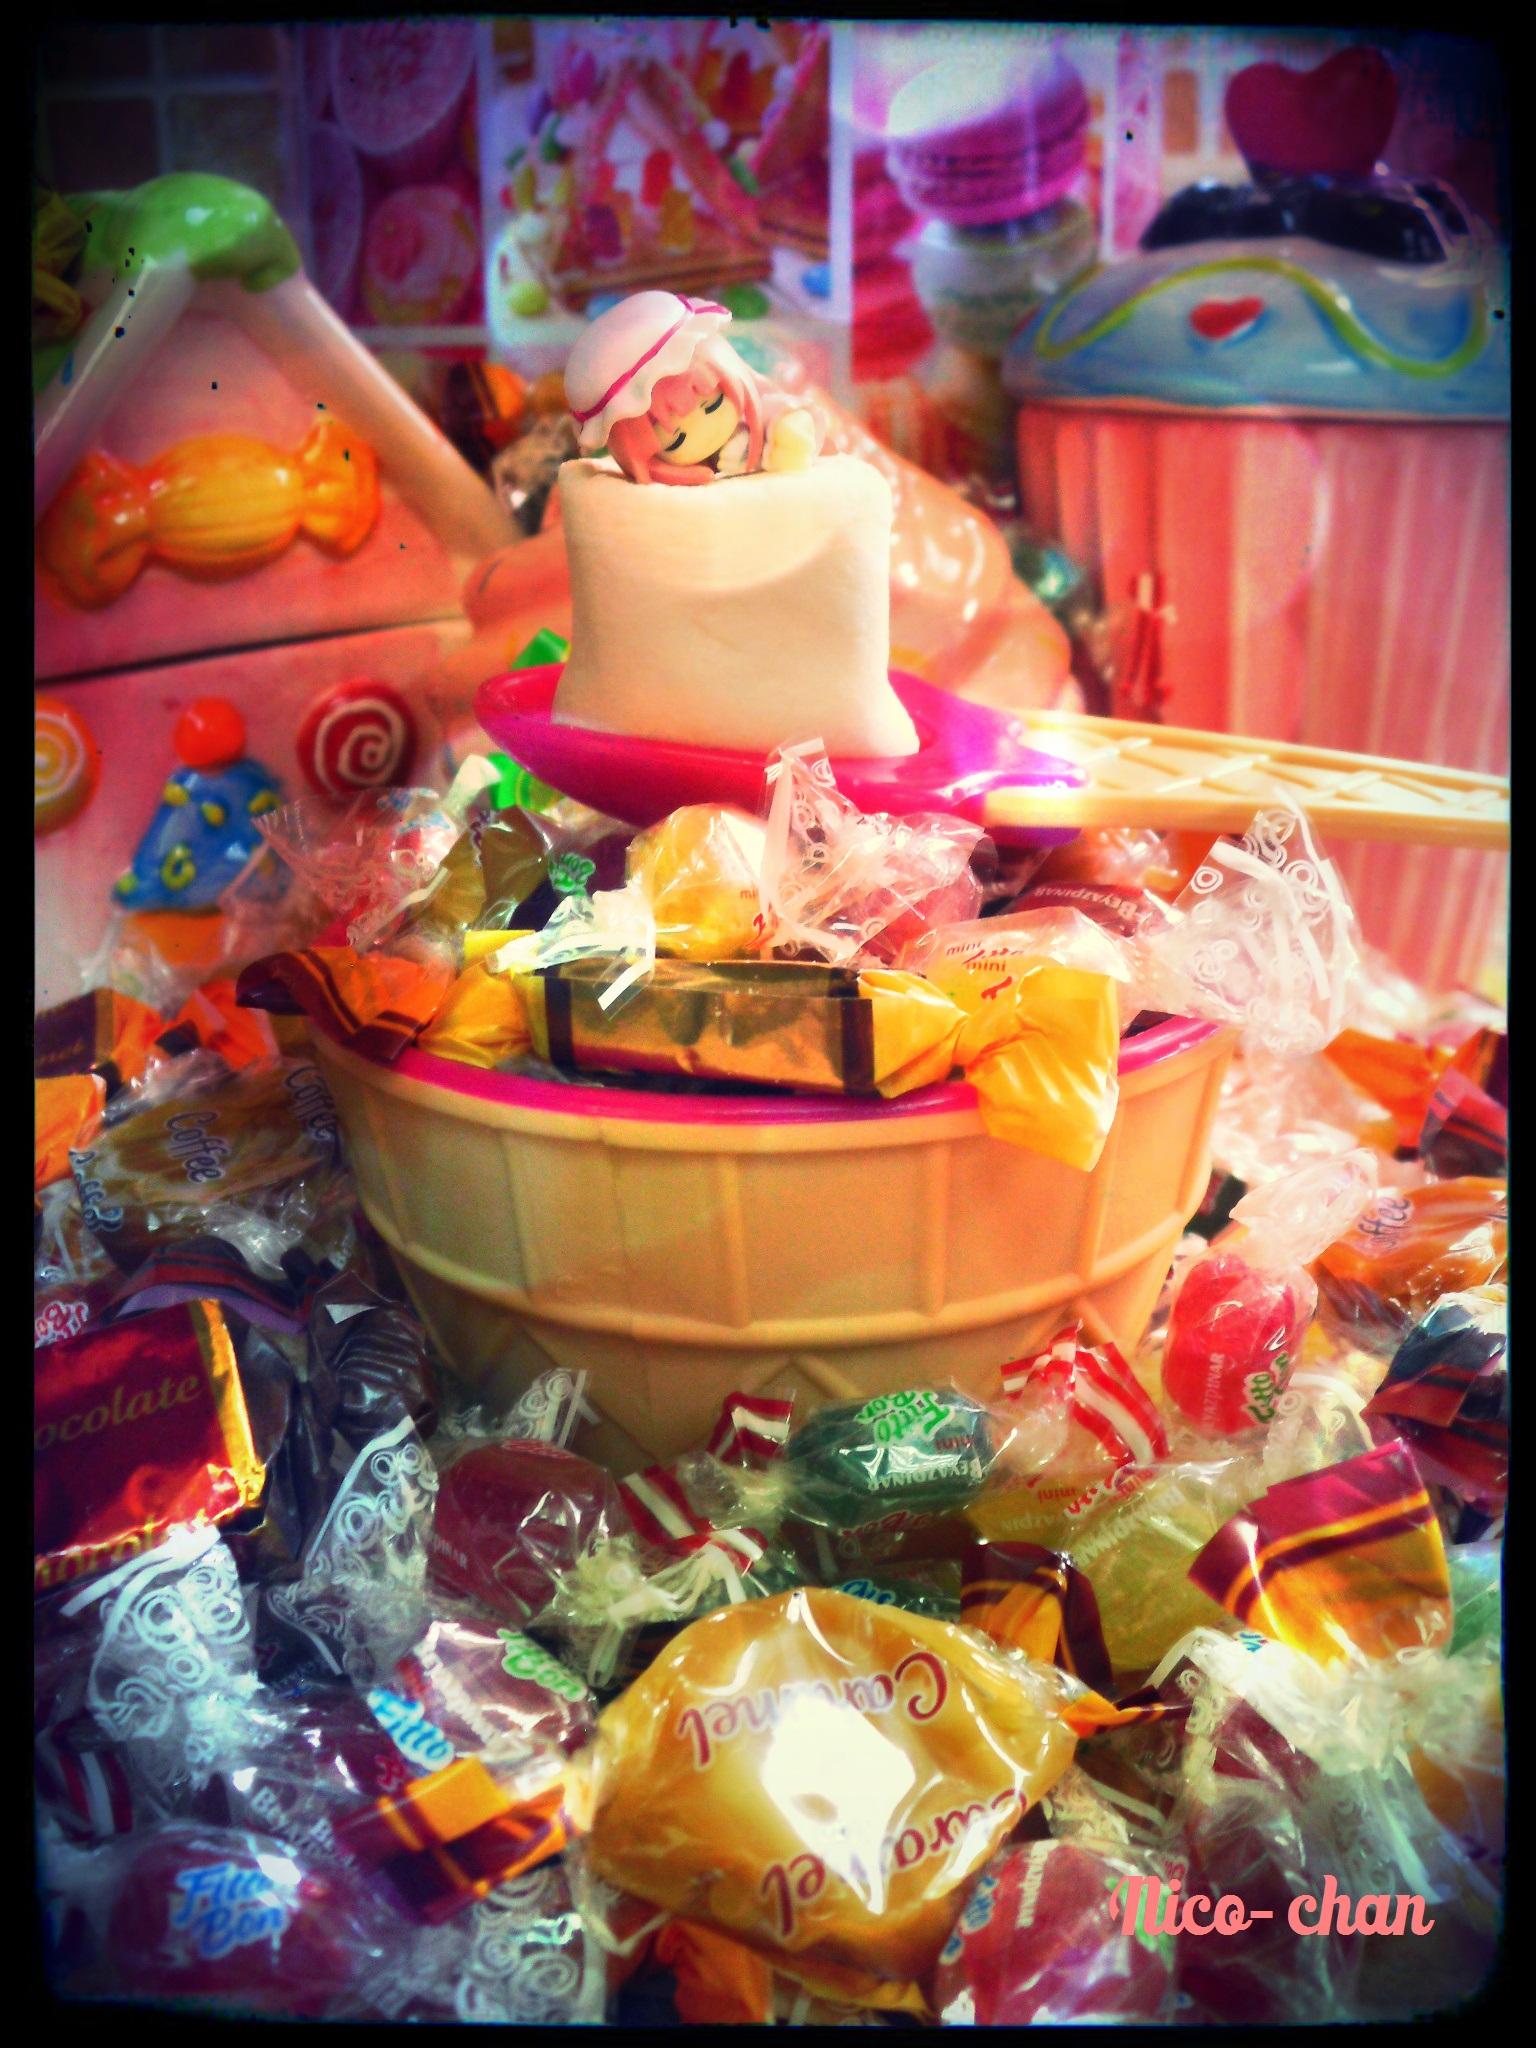 toy's_works ascii_media_works ro-kyu-bu! hakamada_hinata aoyama_sagu earphone_jack_accessory niitengo_sisters